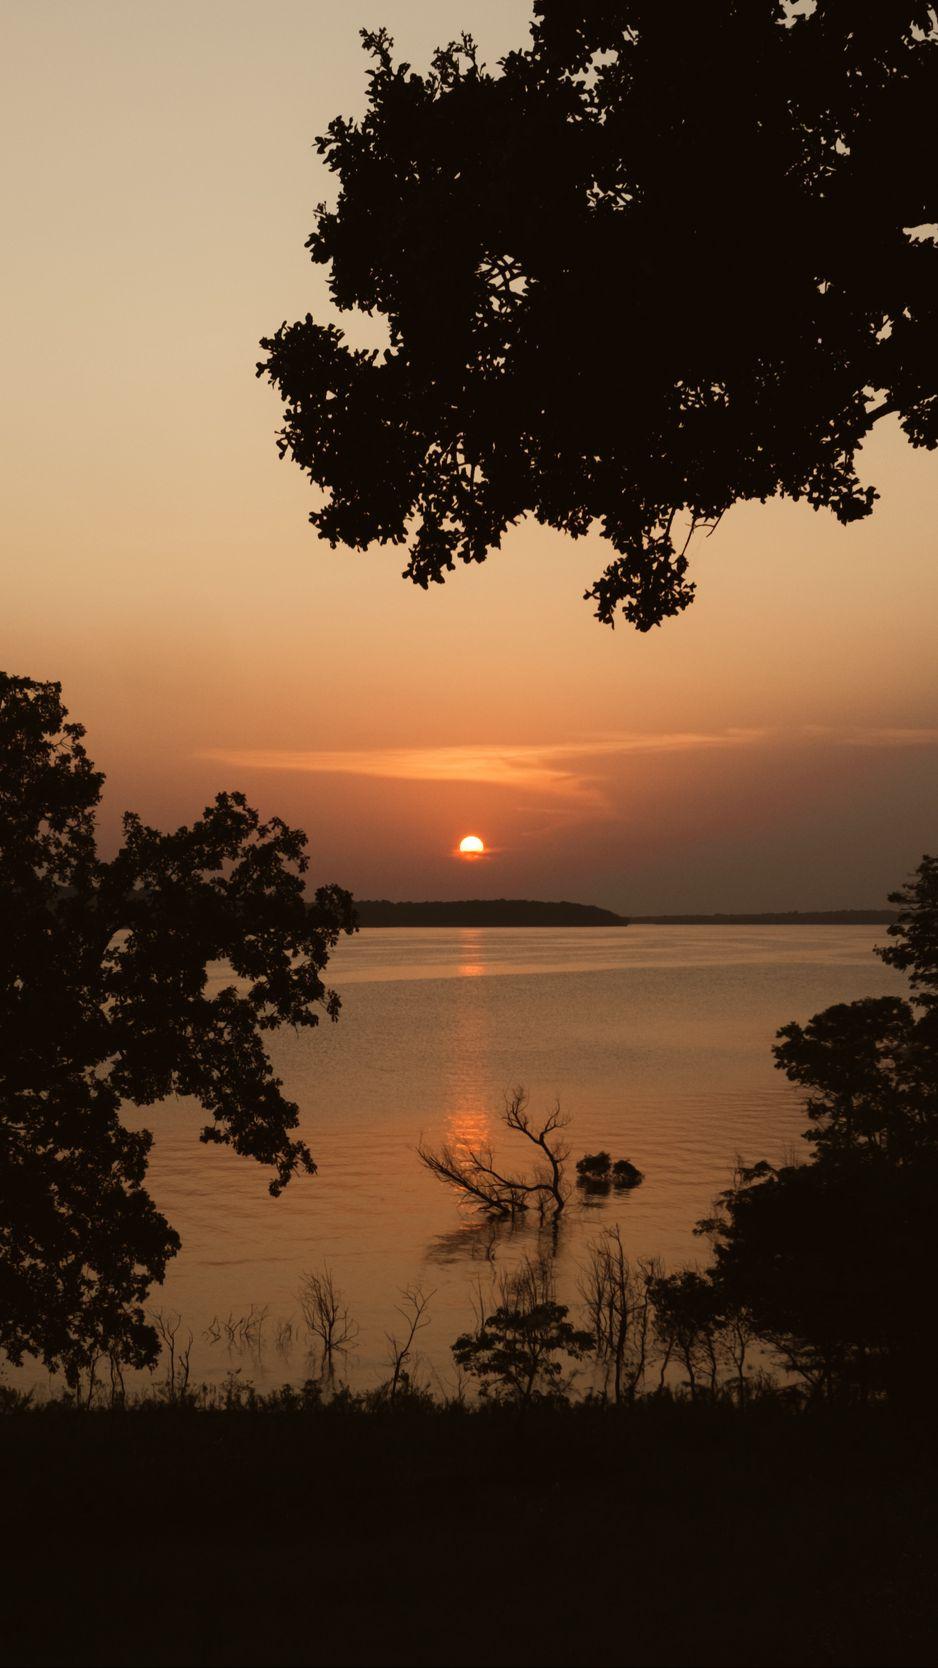 938x1668 Wallpaper sun, sunset, sea, trees, silhouettes, dark